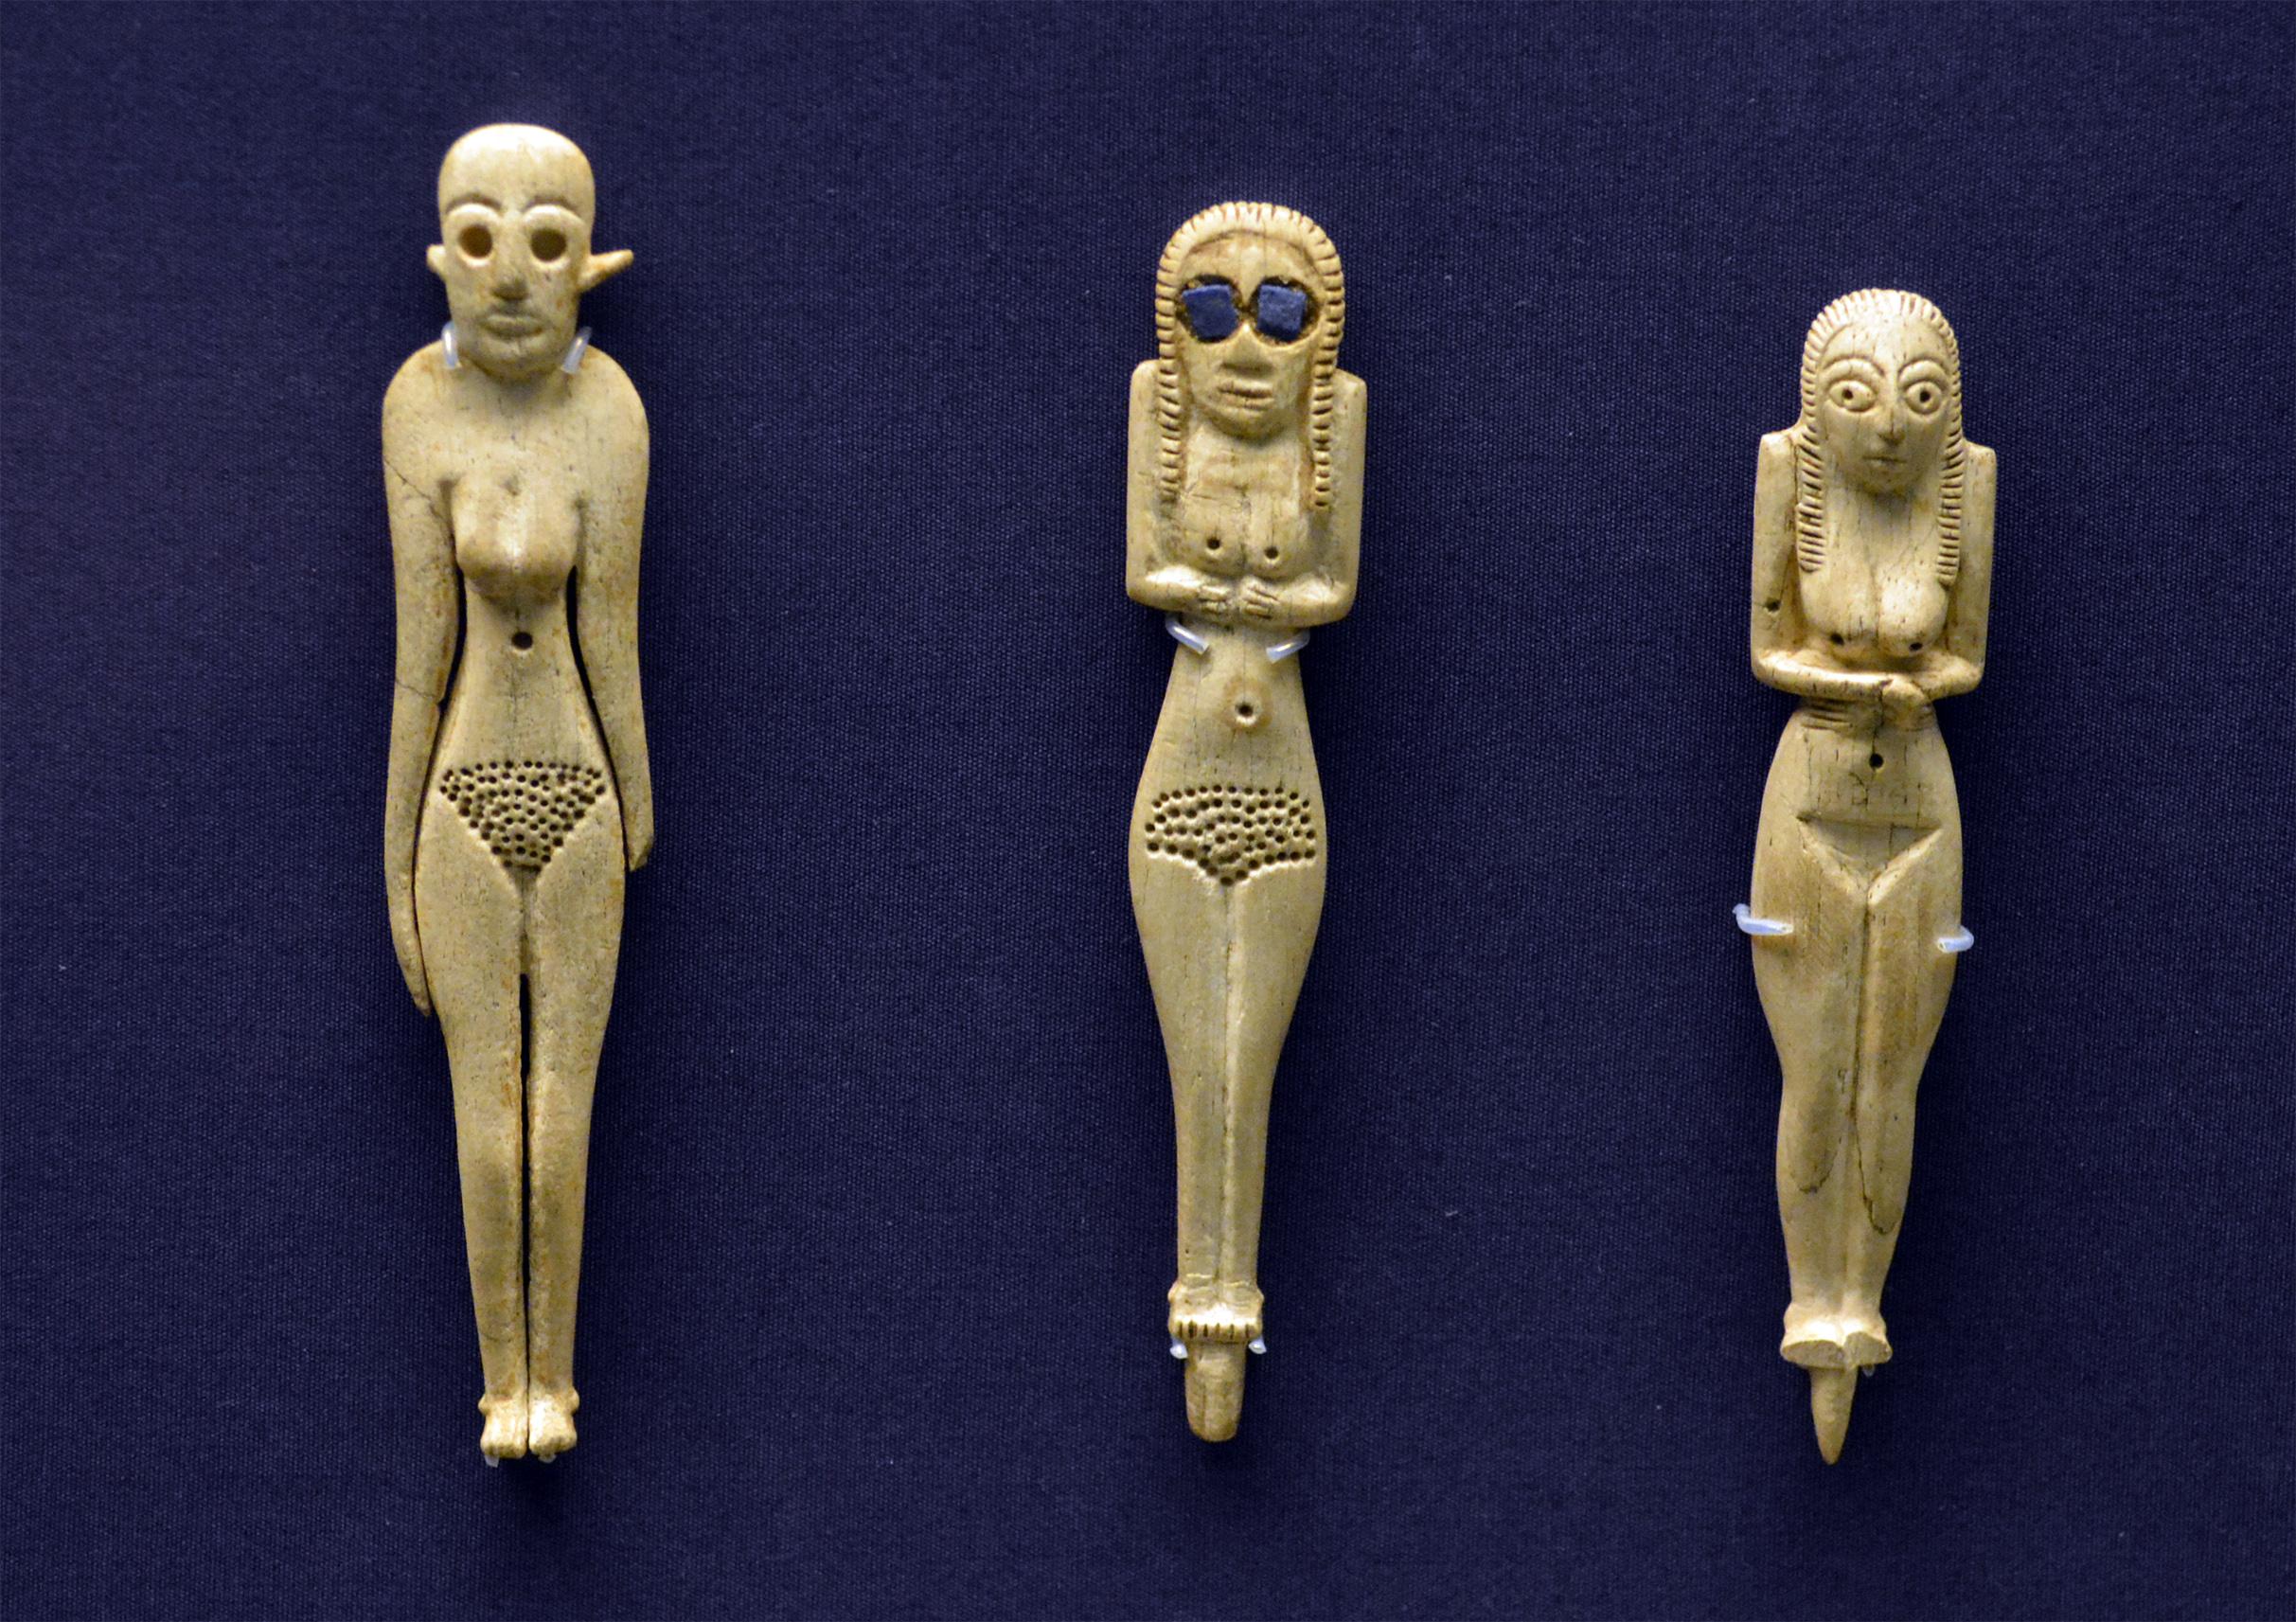 BM Ivory statuette DSC_2890